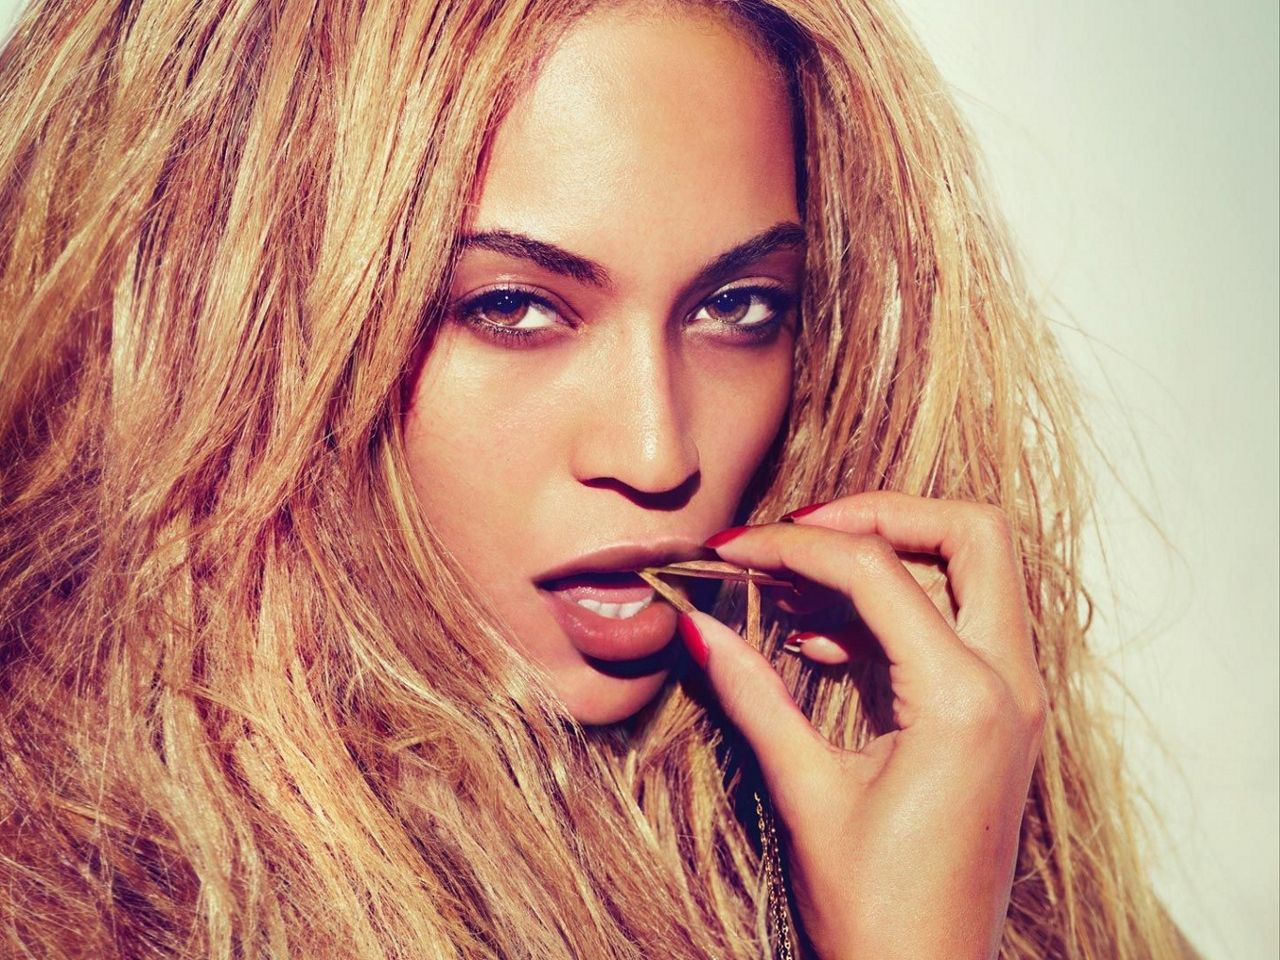 Beyoncé Green light wallpaper Google zoeken 057